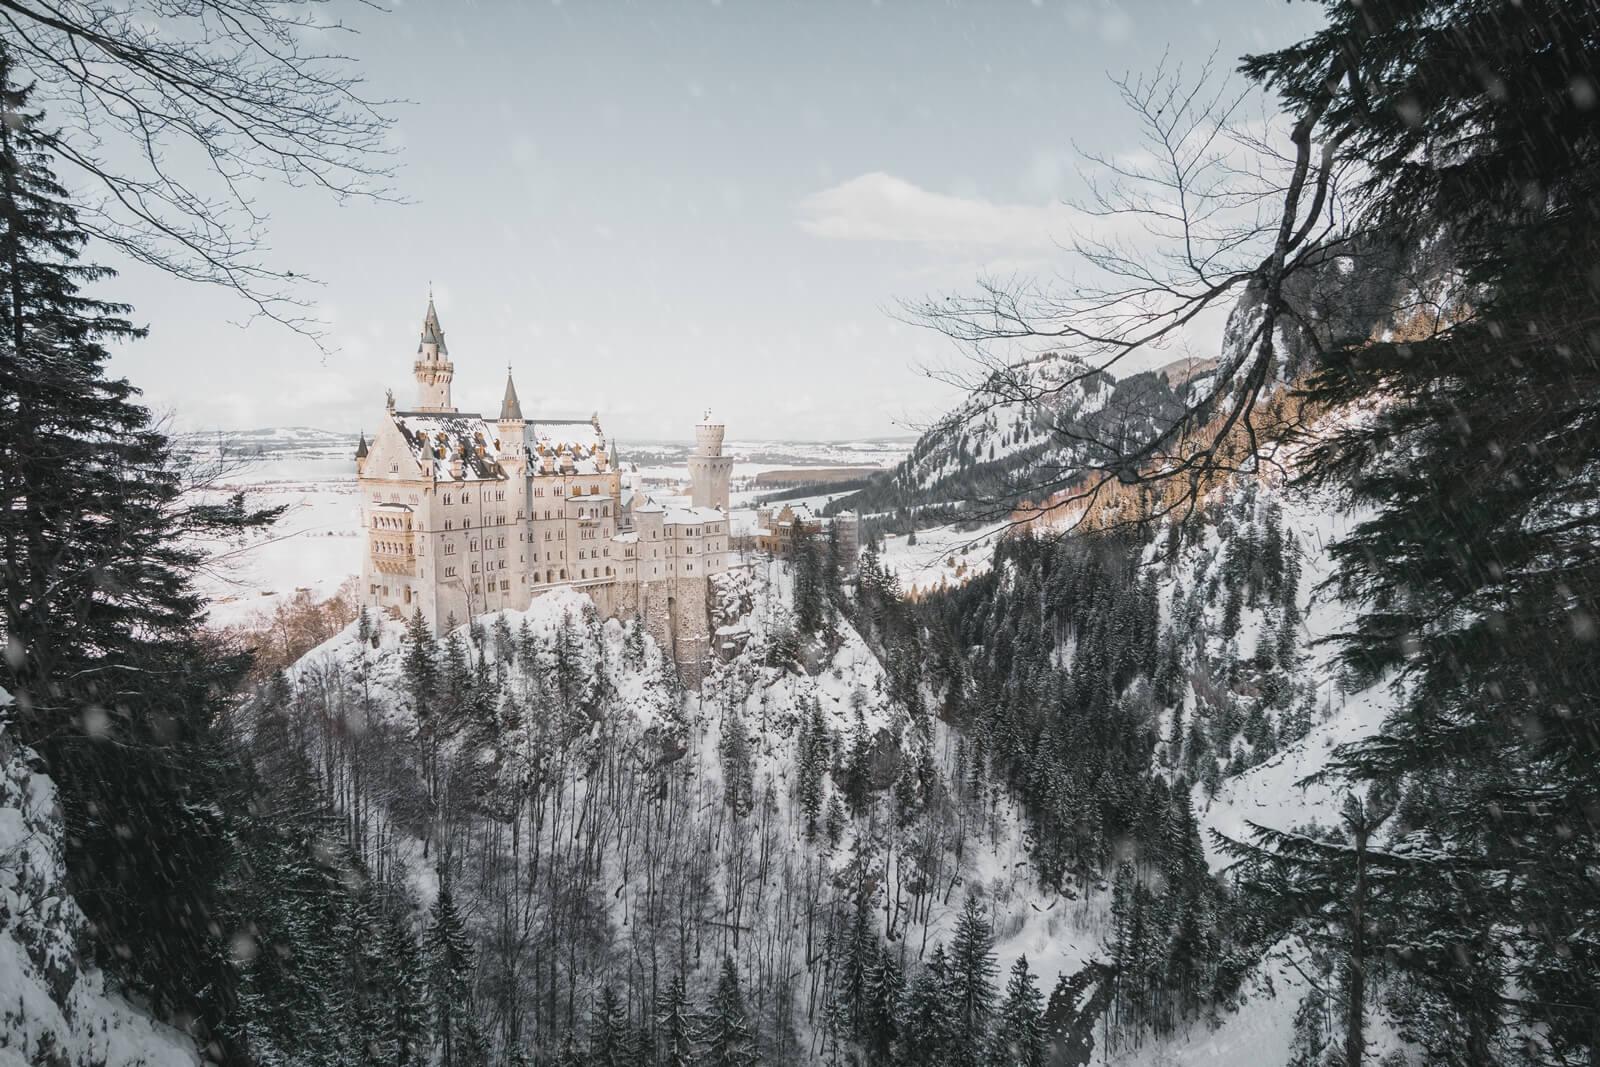 neuschwanstein-castle-fussen-bavaria-germany-la-vie-en-blog3